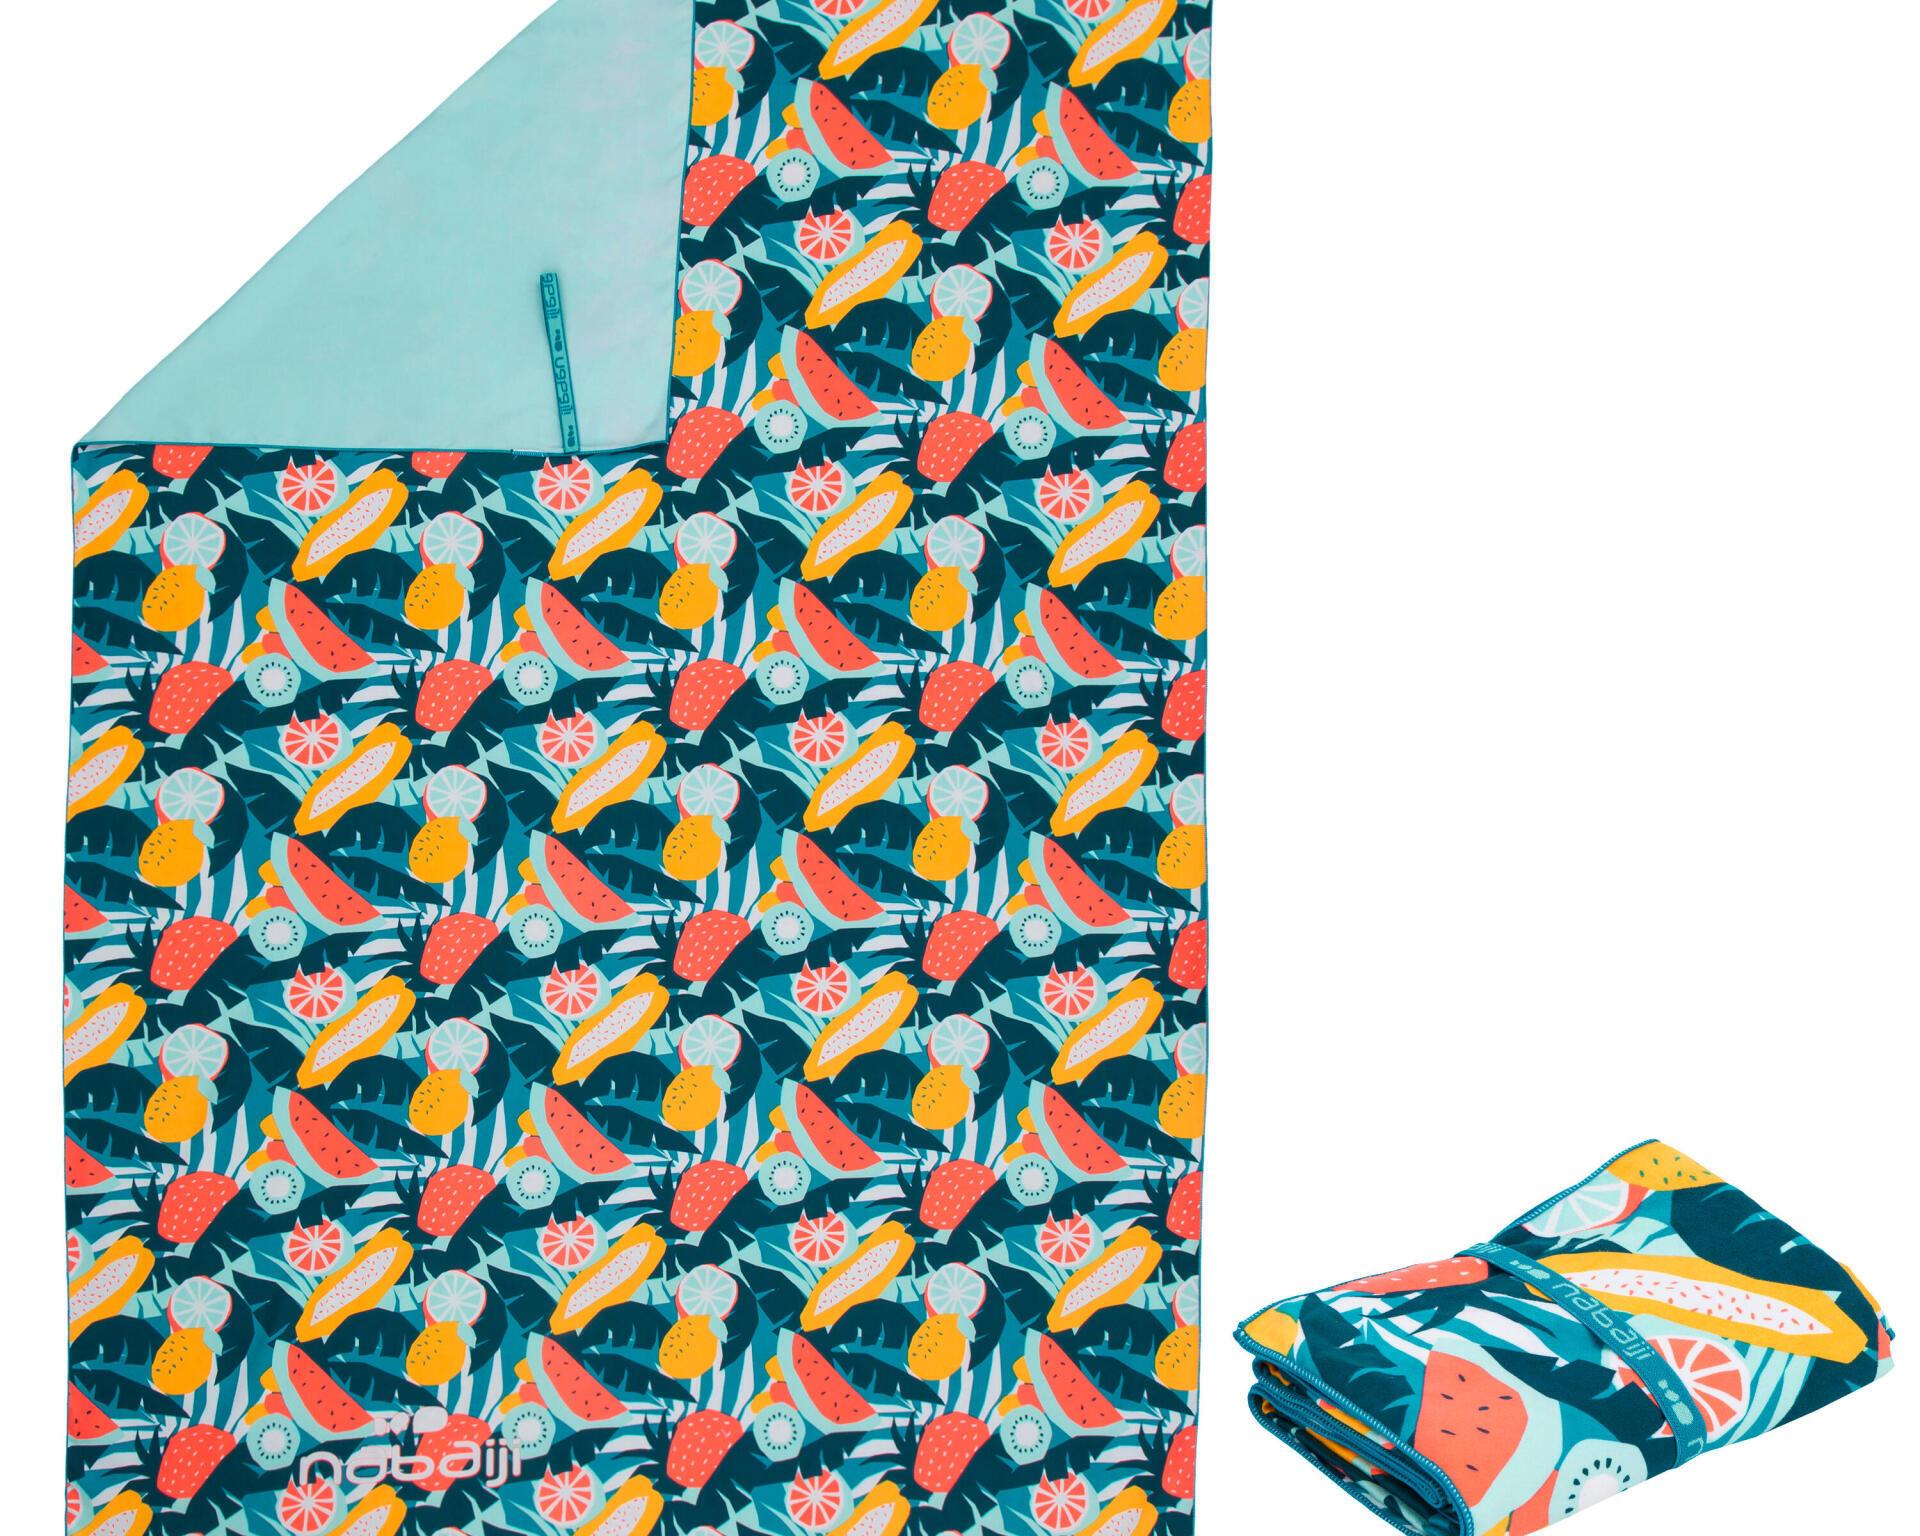 PRINTED MICROFIBRE TOWEL WITH PRESS STUDS, SIZE L 80 X 130 CM